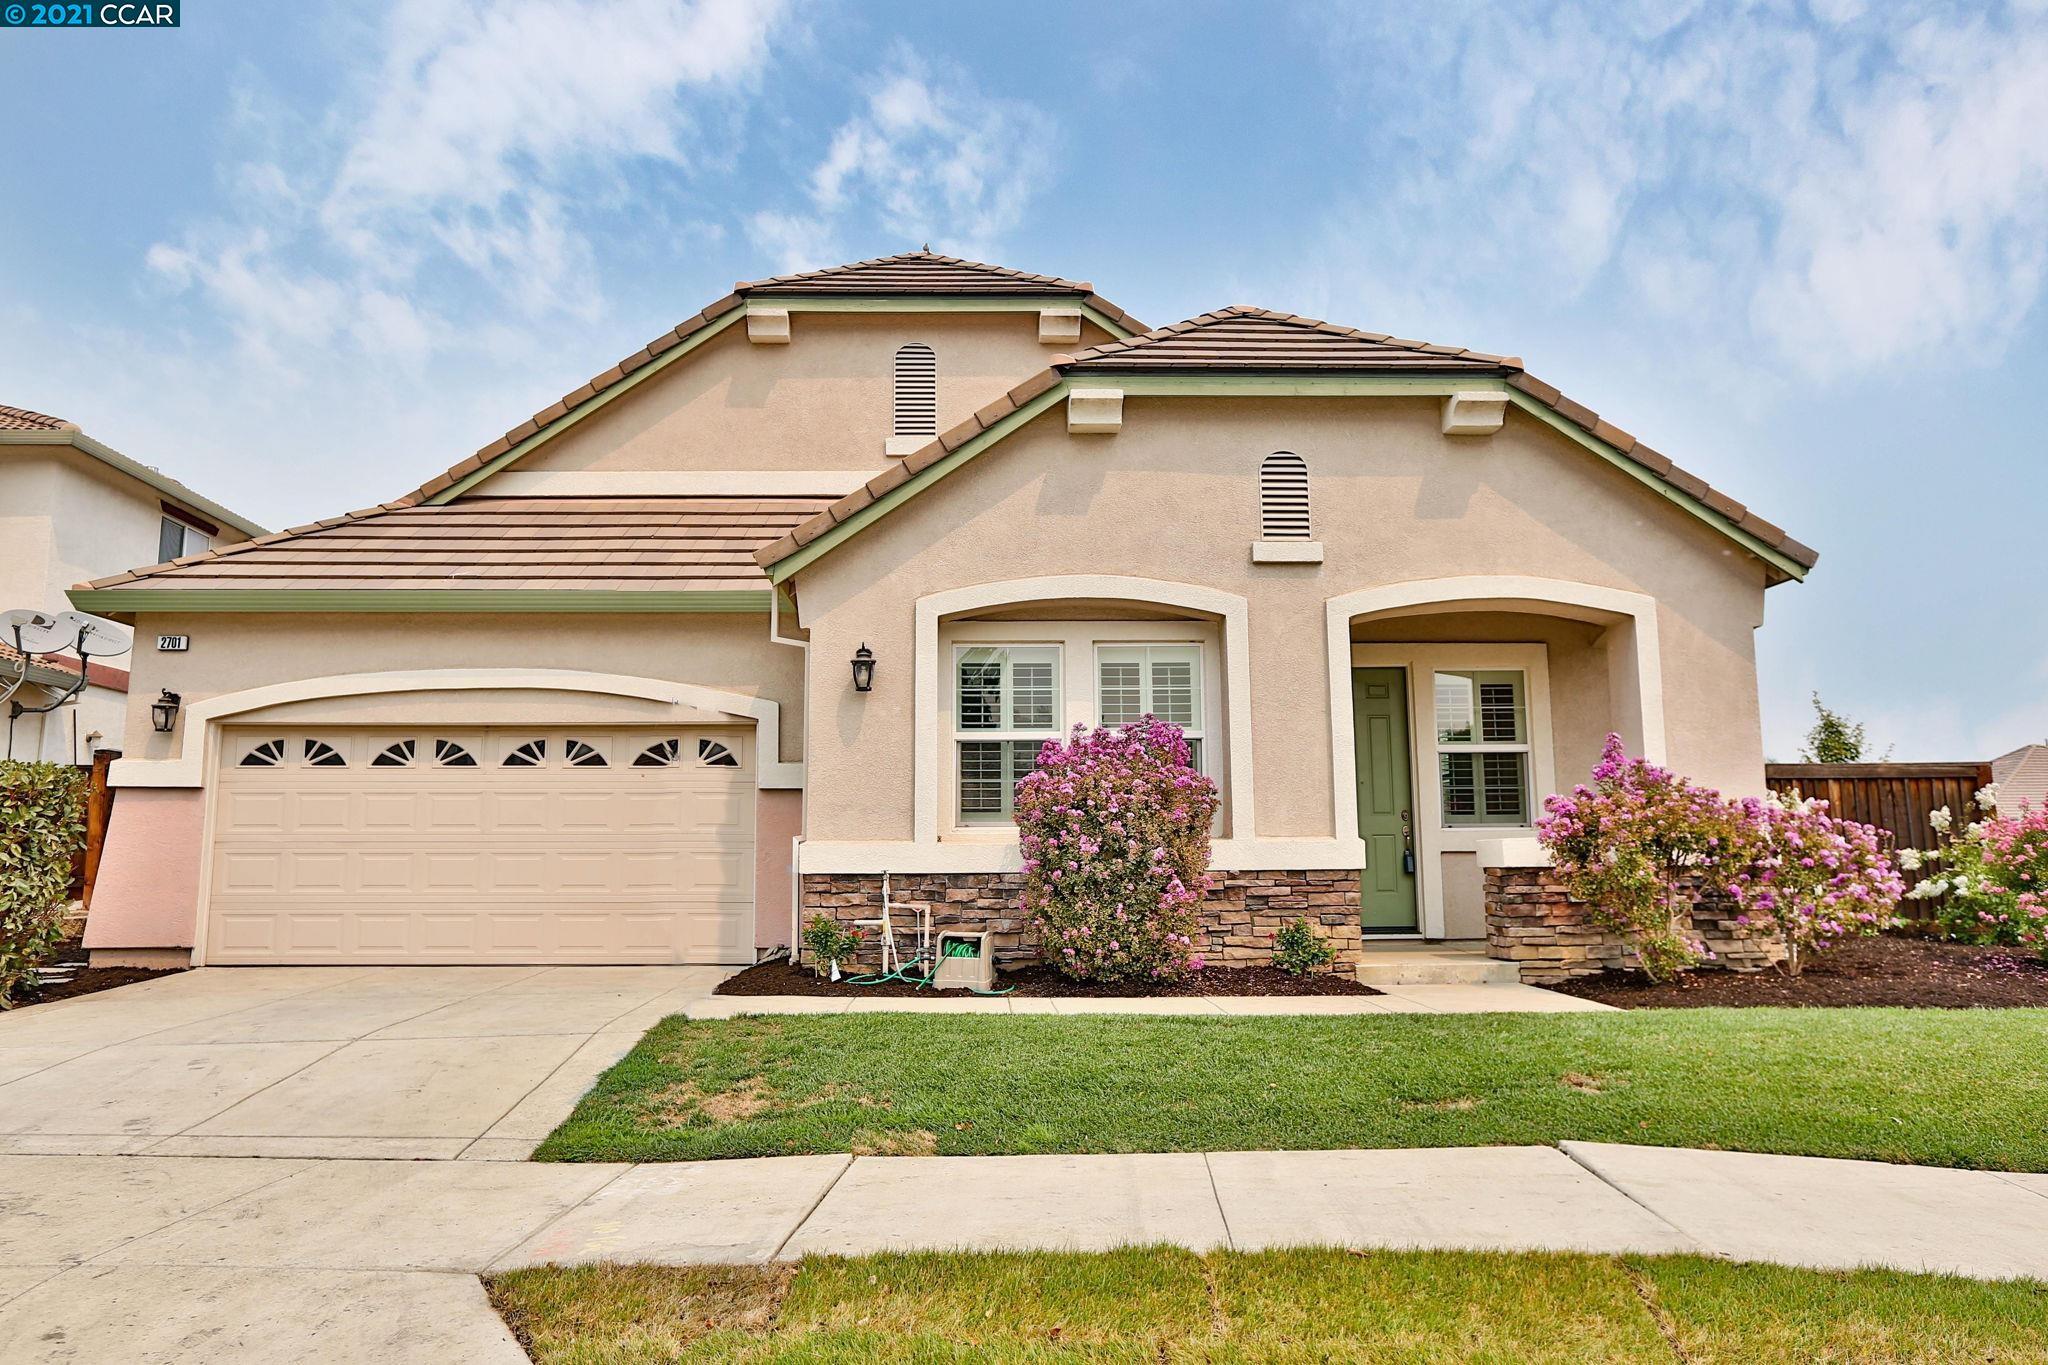 2701 Rancho Canada Dr, BRENTWOOD, CA 94513